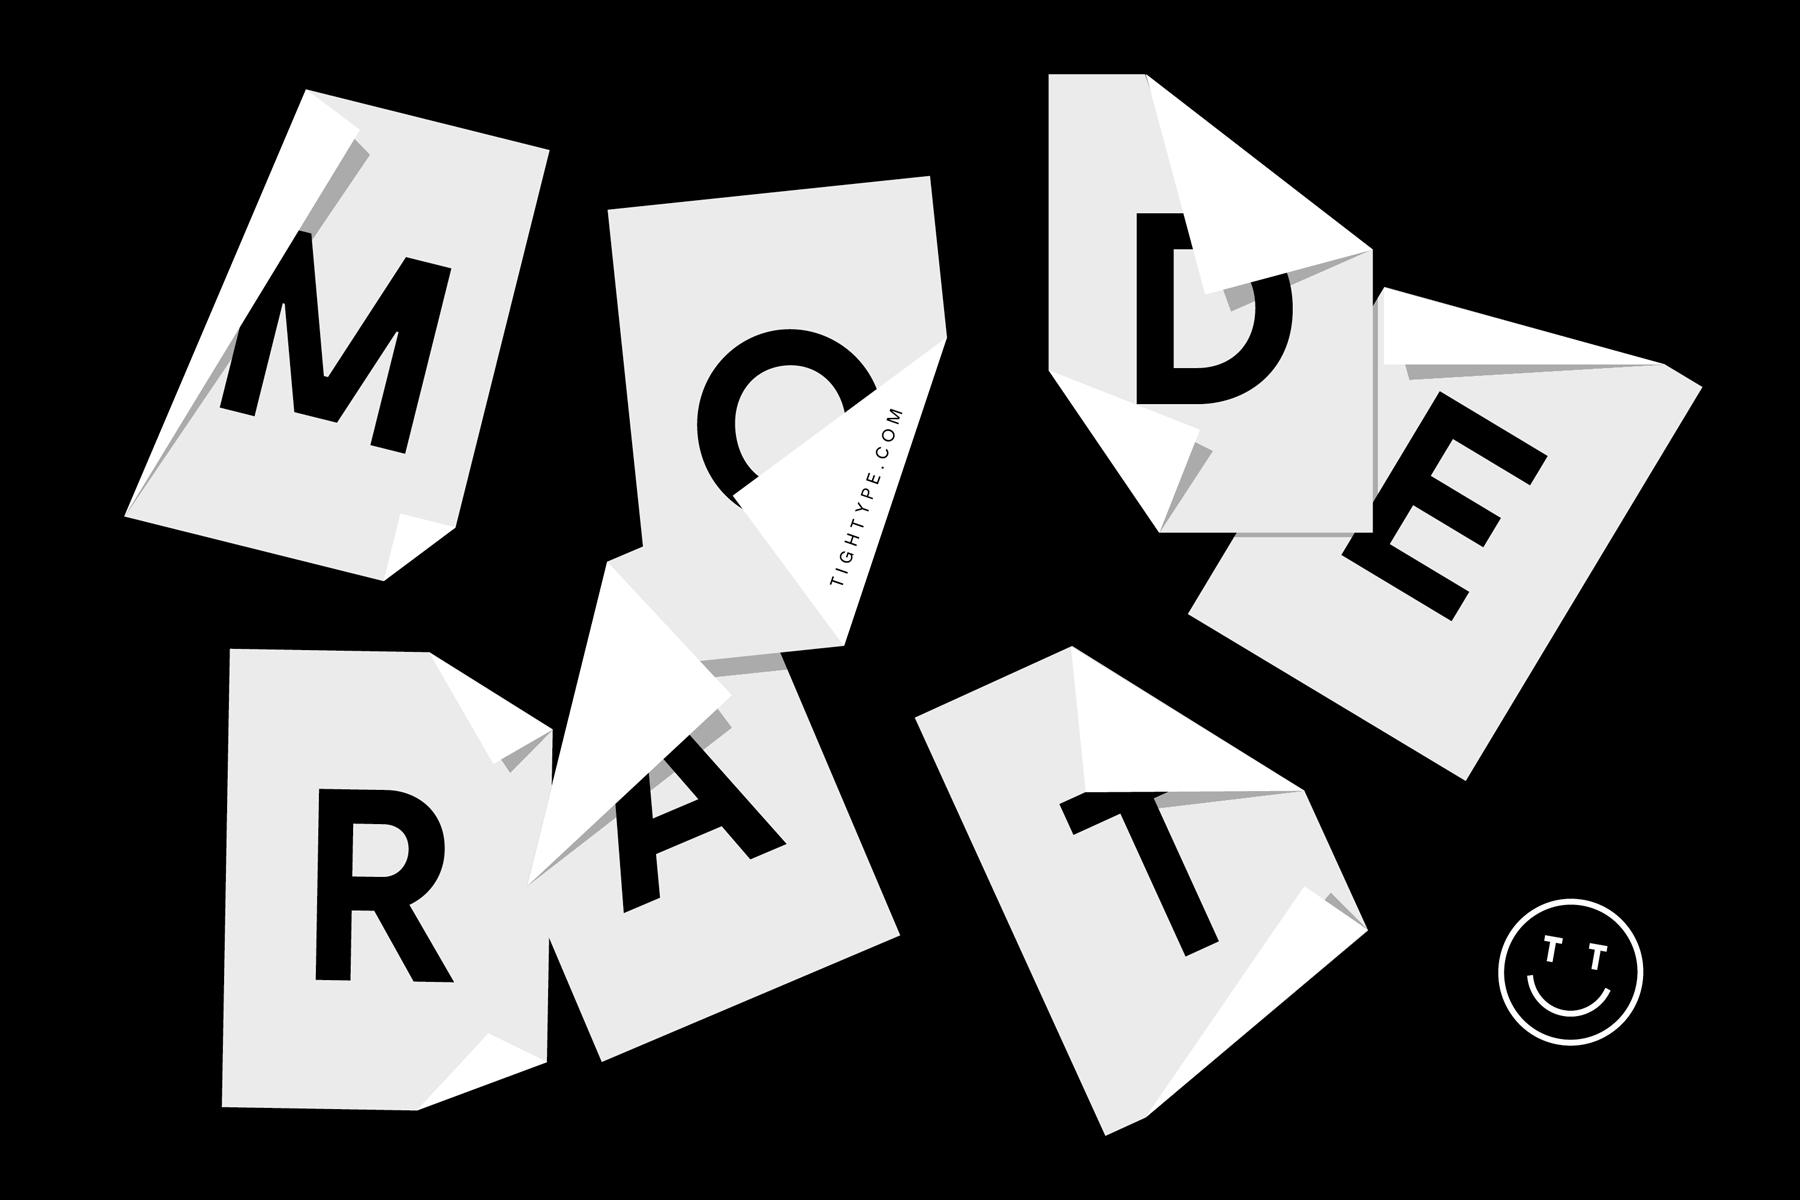 Moderat Typeface on Behance